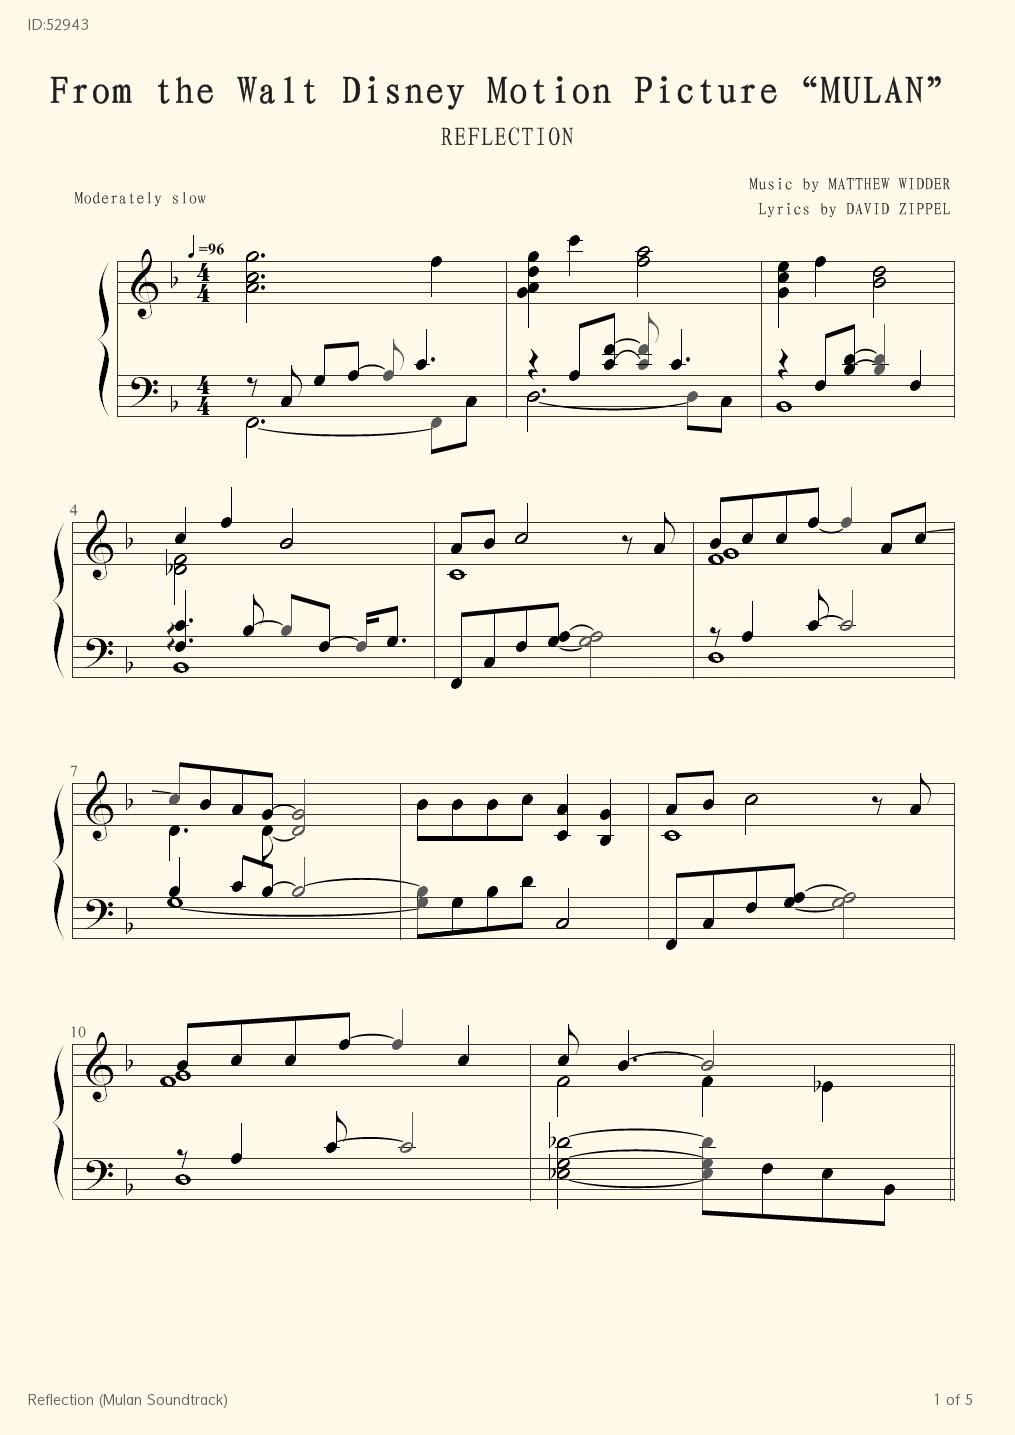 Reflection Mulan Soundtrack - Christina Aguilera - first page